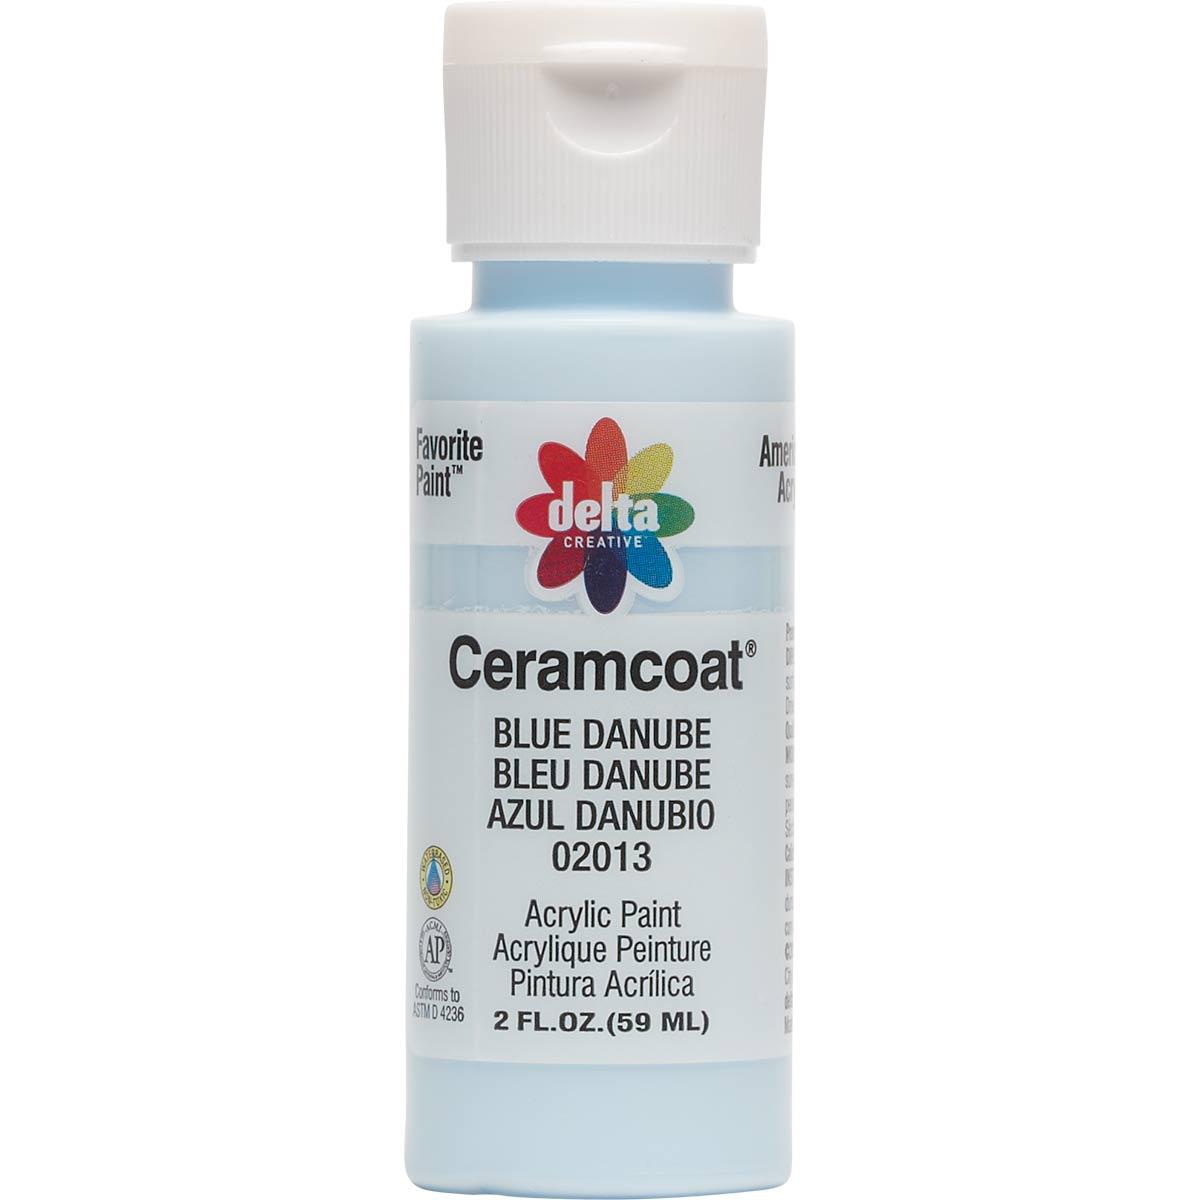 Delta Ceramcoat ® Acrylic Paint - Blue Danube, 2 oz. - 020130202W